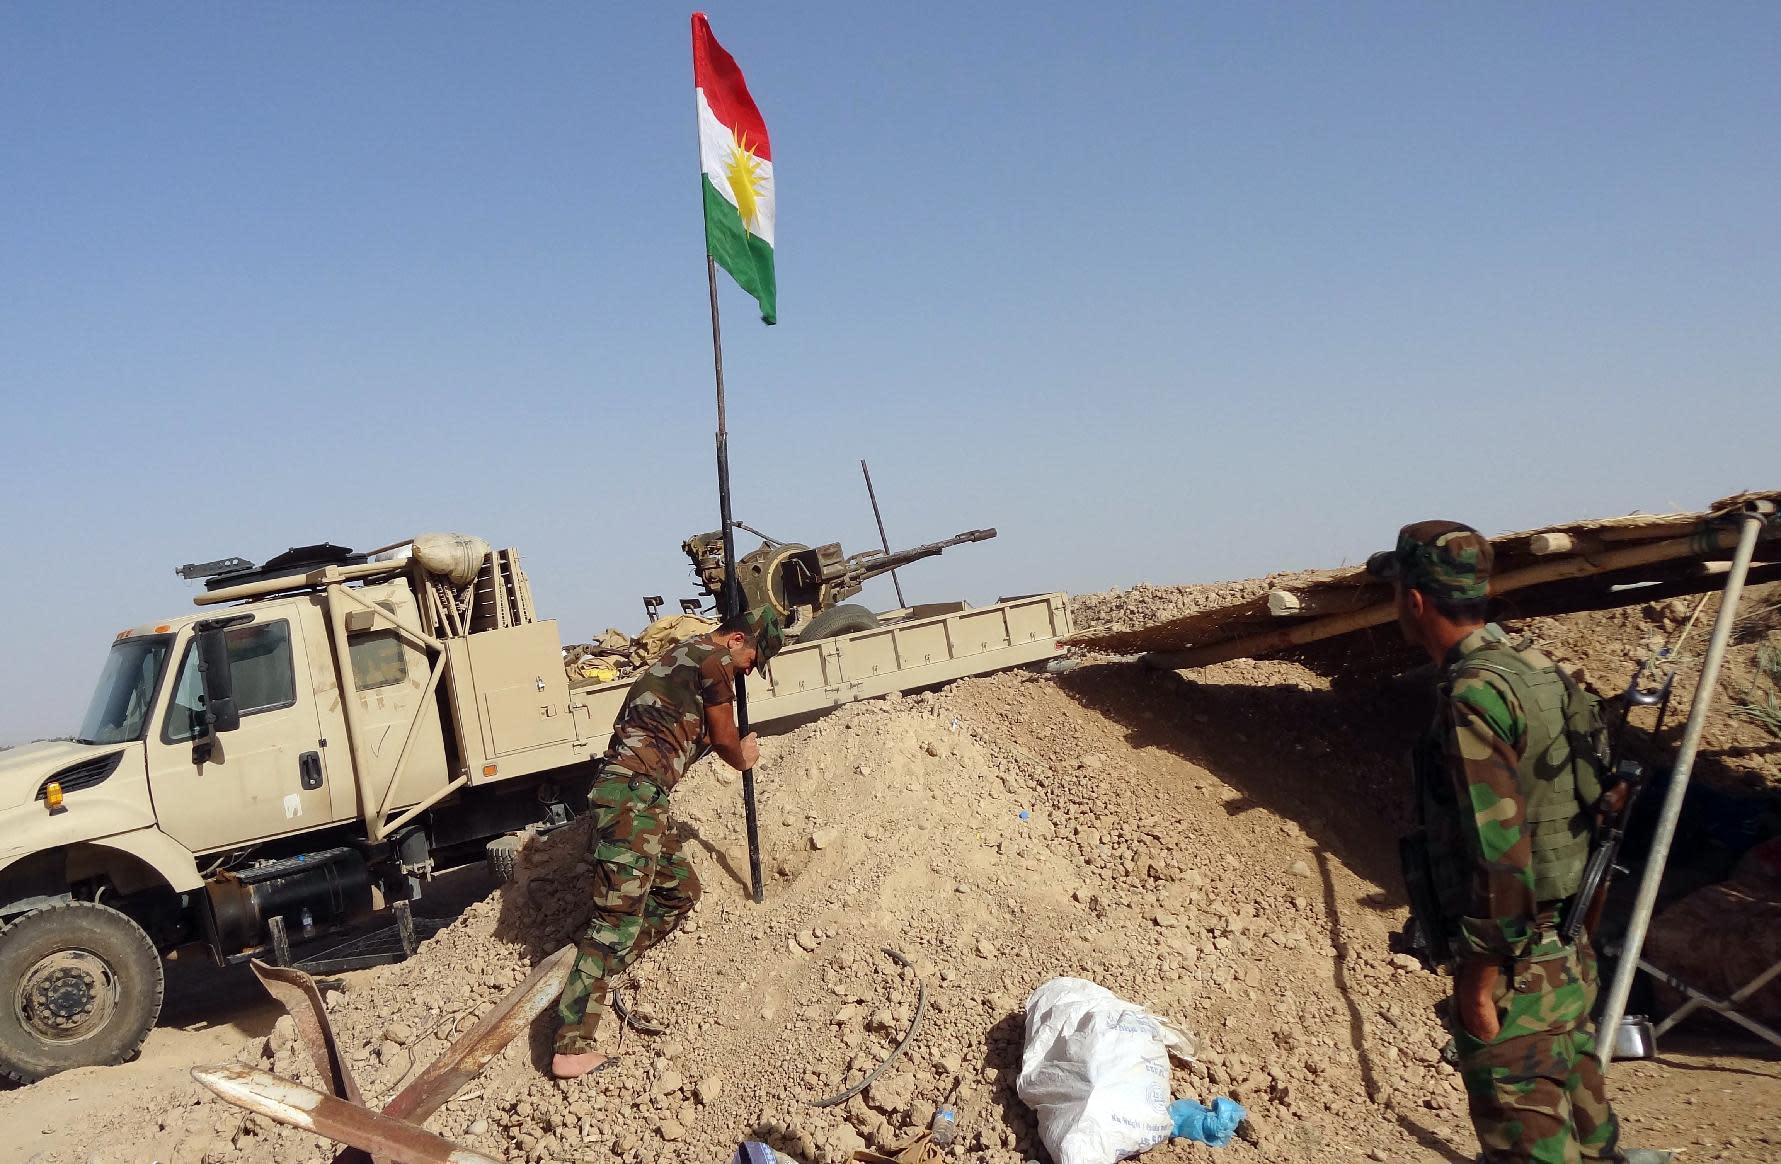 Kurdish Peshmerga forces raise the Kurdish flag at a checkpoint on the road leading from Kirkuk to northern Iraqi city of Tikrit on June 30, 2014 (AFP Photo/Marwan Ibrahim )